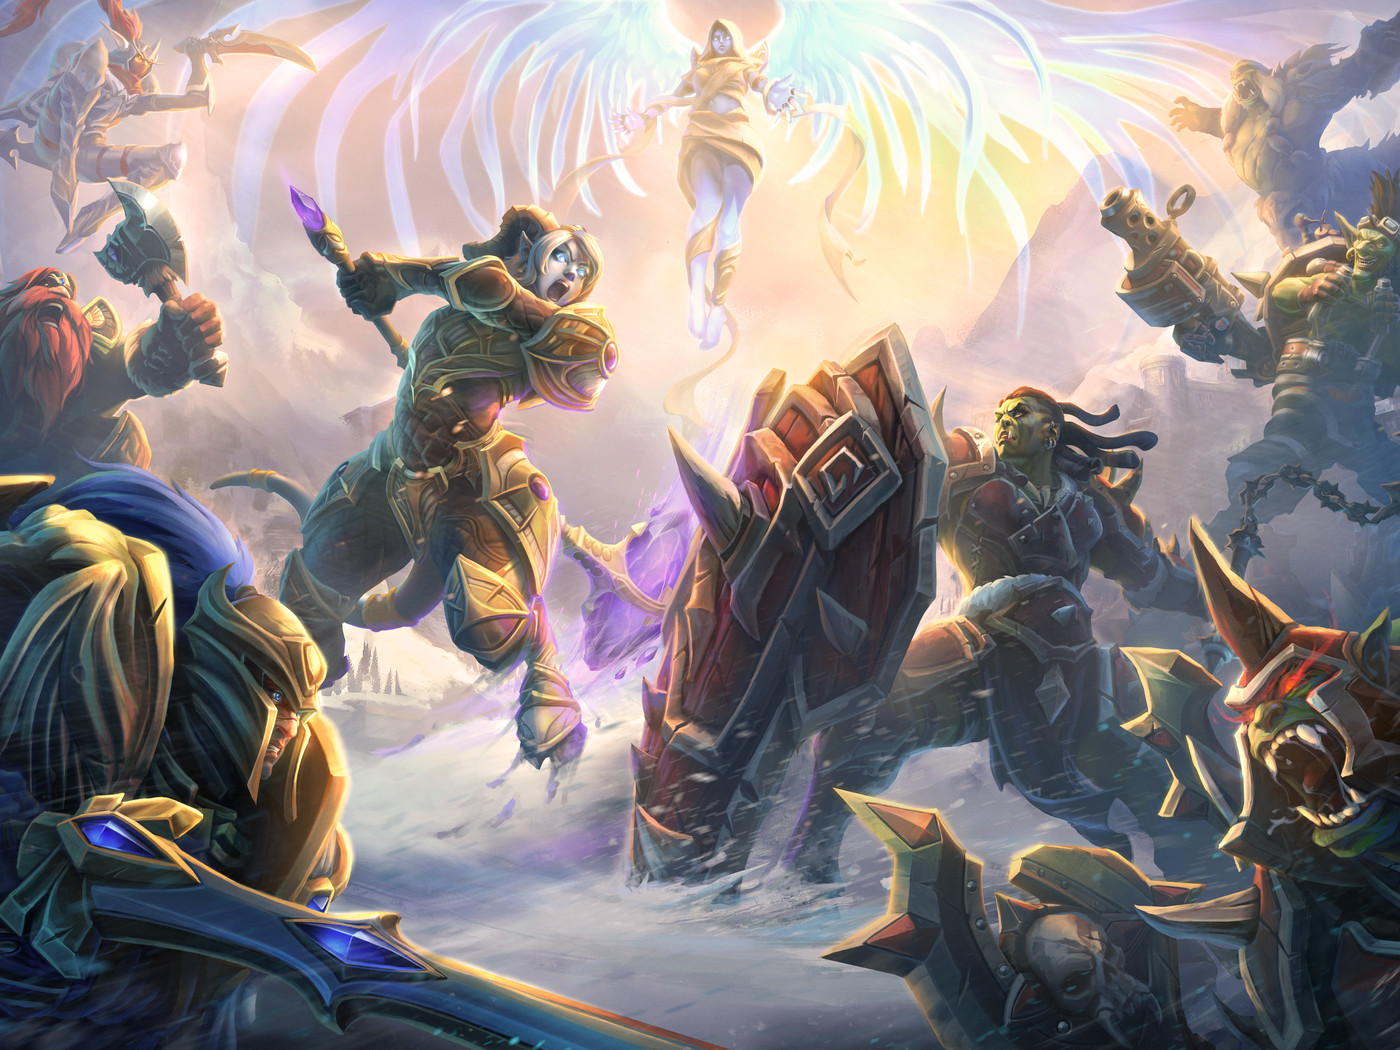 Heroes of the Storm - Aliance vs Horde